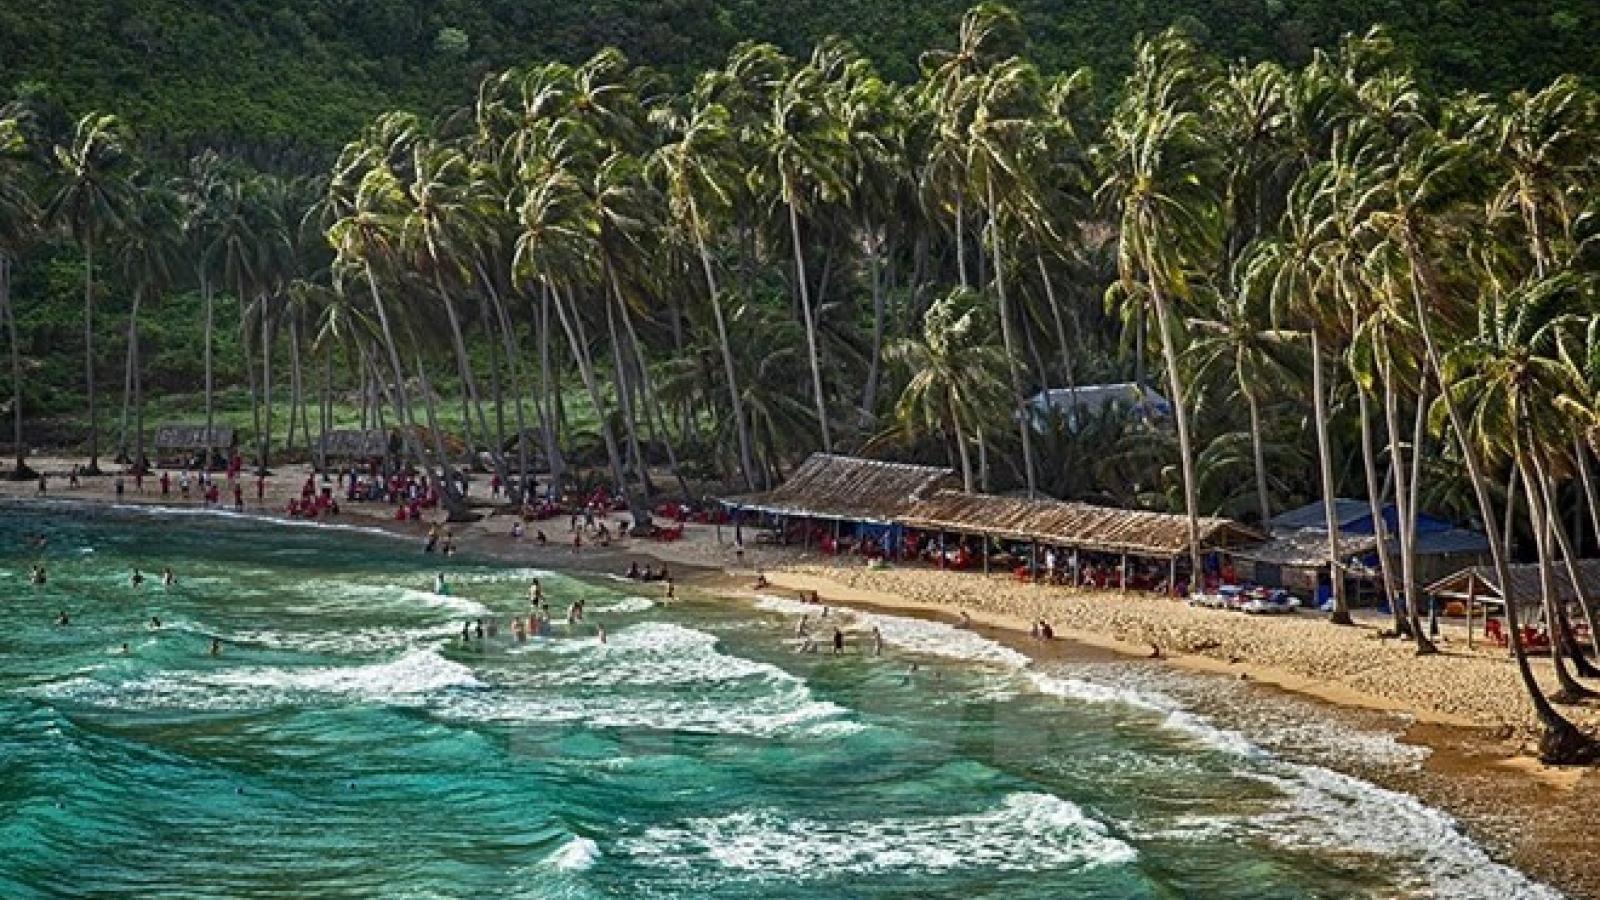 Visitors explore beauty of Vietnam's seas, islands through photos